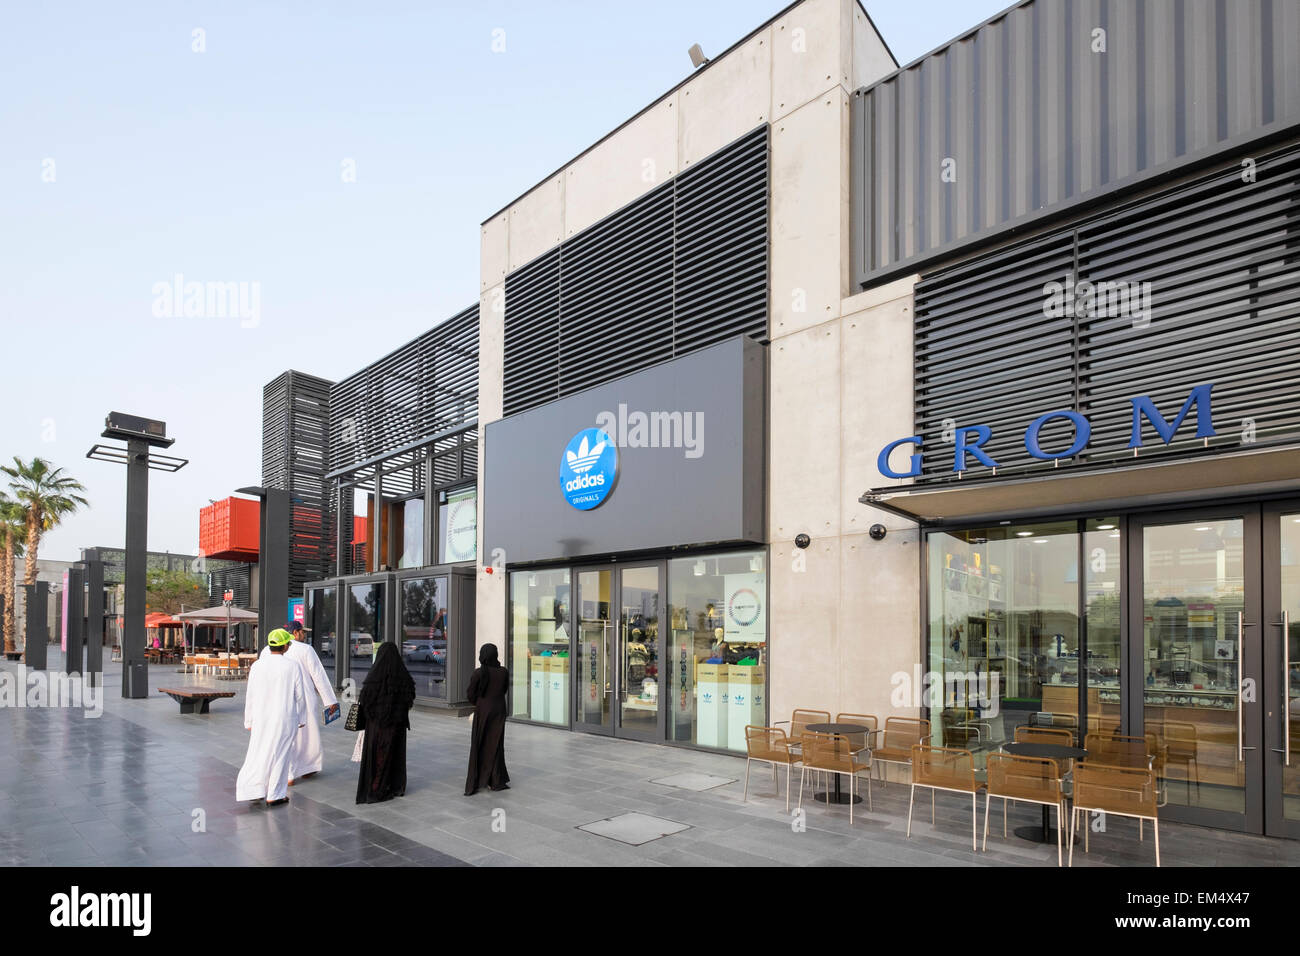 New Boxpark retail development in Dubai United Arab Emirates - Stock Image